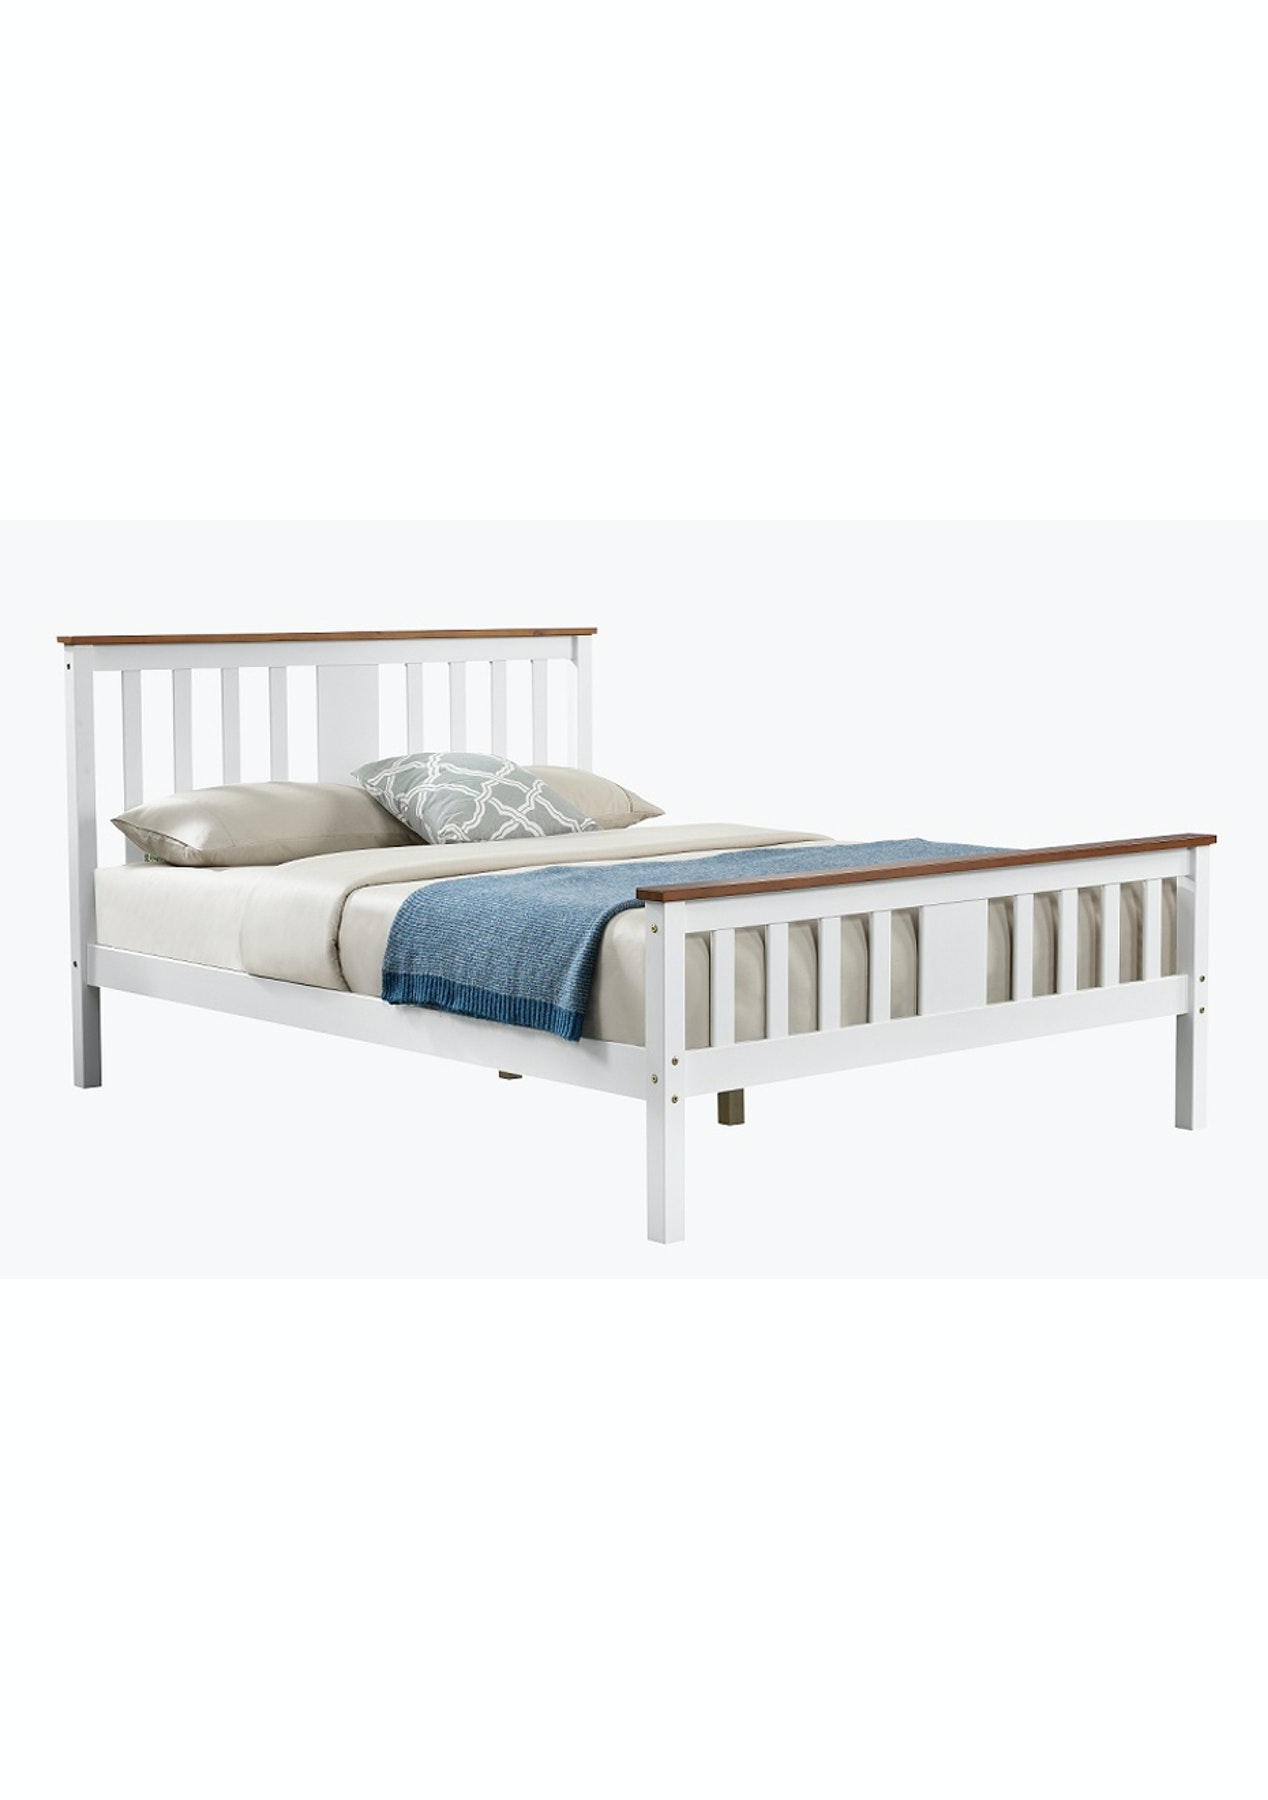 Norris Bed Frame Queen Affordable Bedroom Furniture Onceit